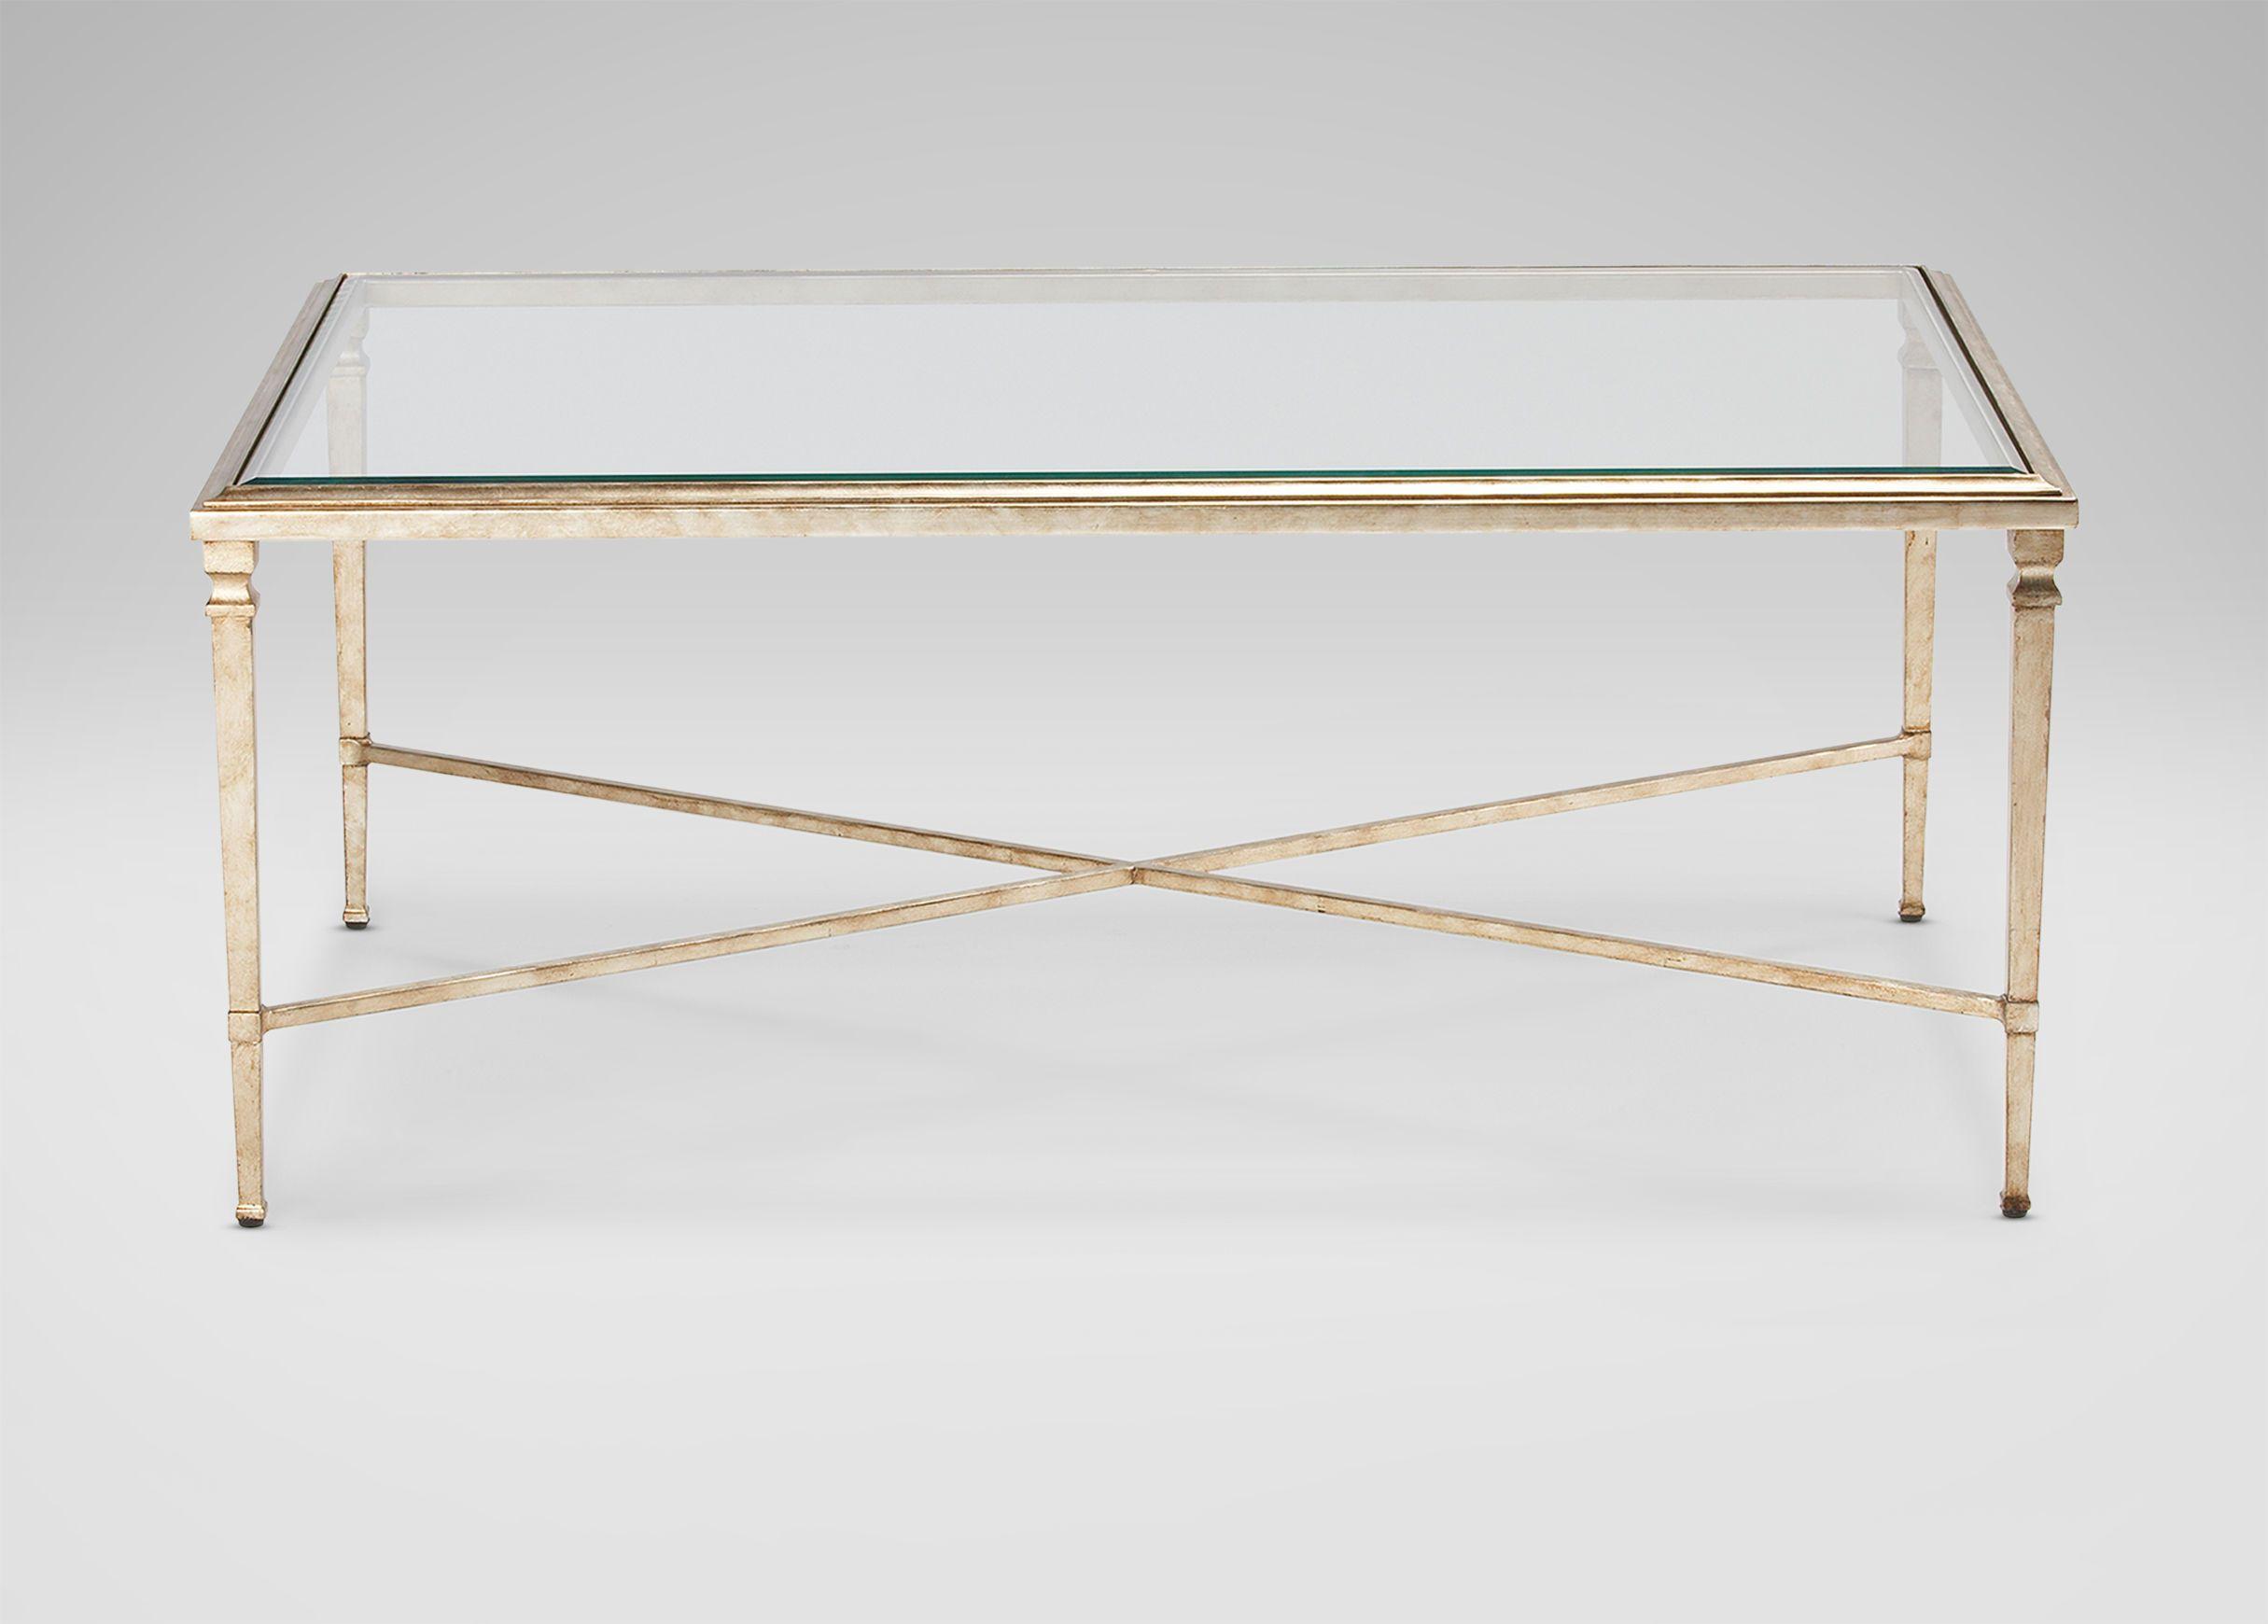 Rectangular Heron Coffee Table Coffee Tables [ 1740 x 2430 Pixel ]